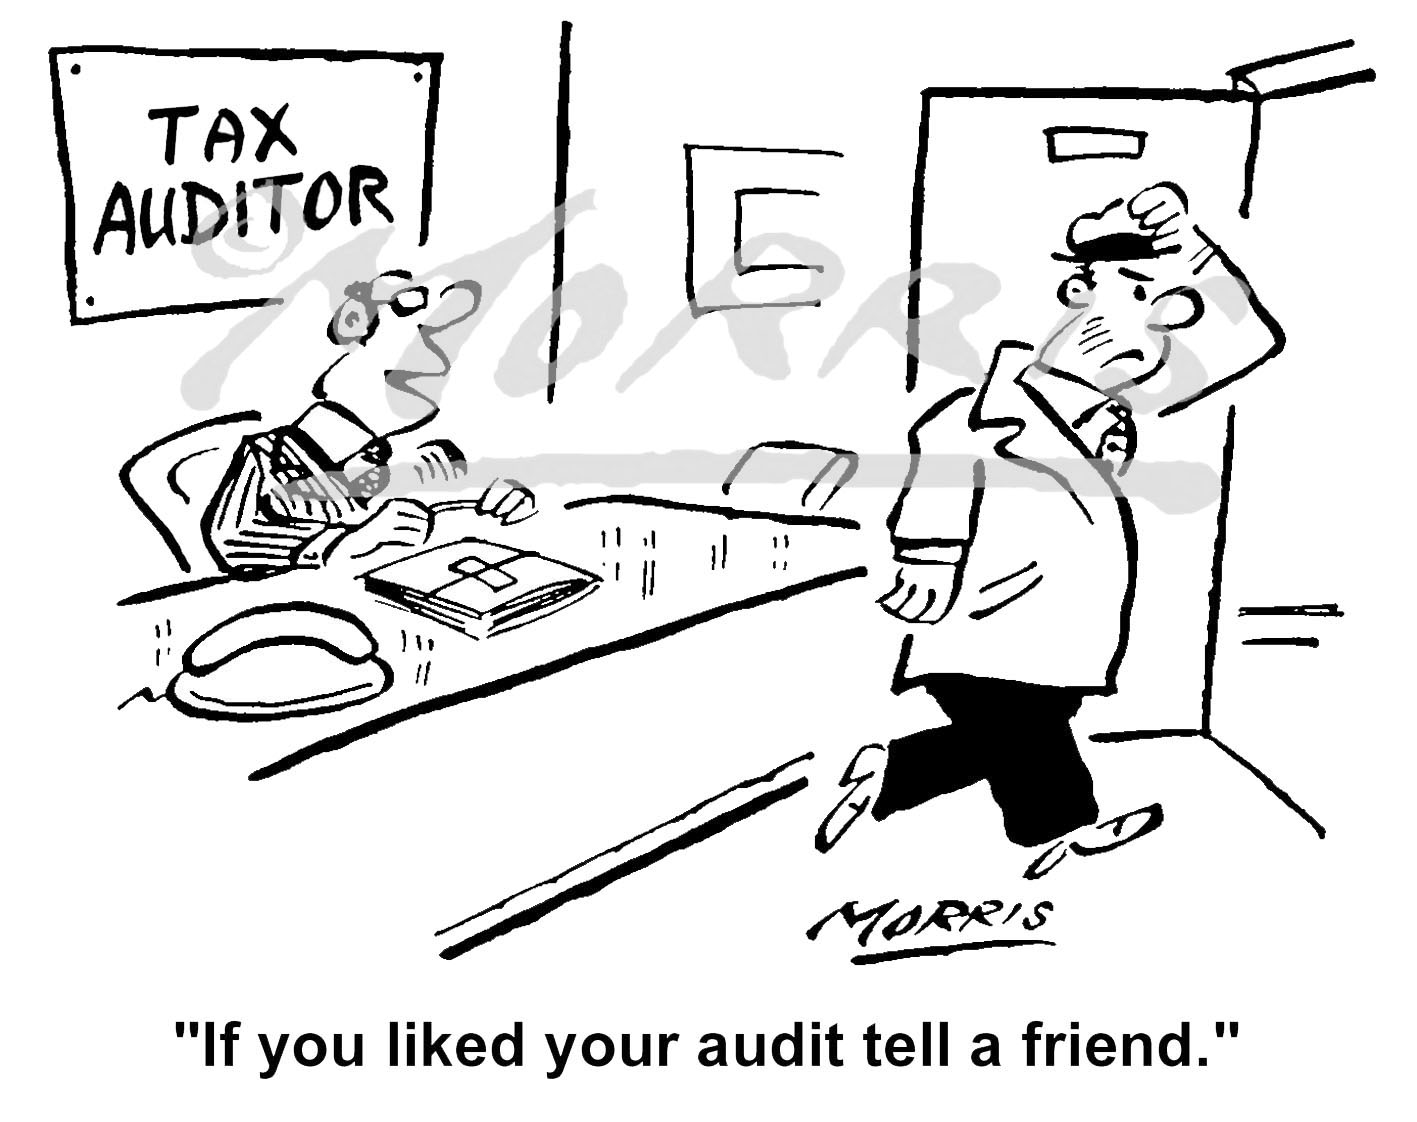 Accounting business cartoon – Ref: 3885bw